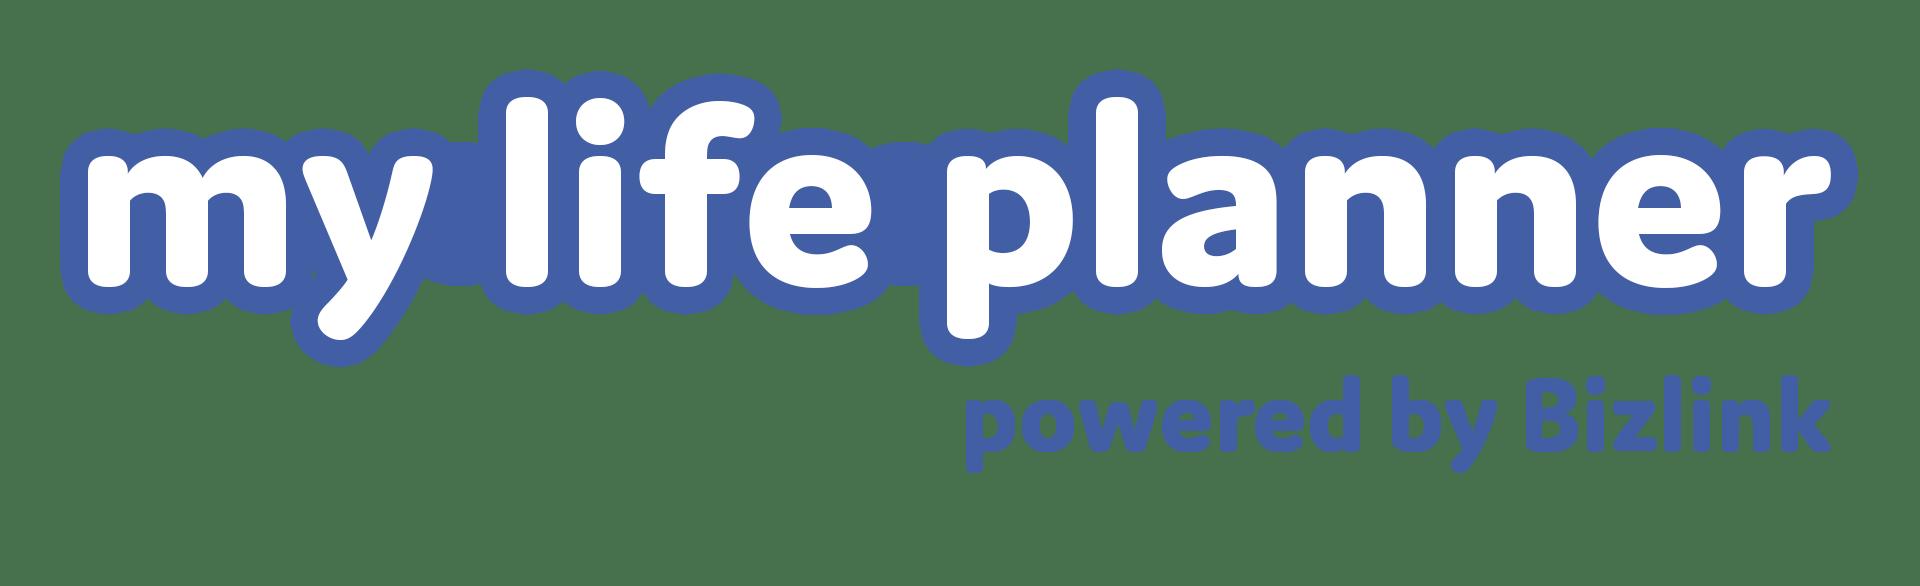 mylifeplanner logo